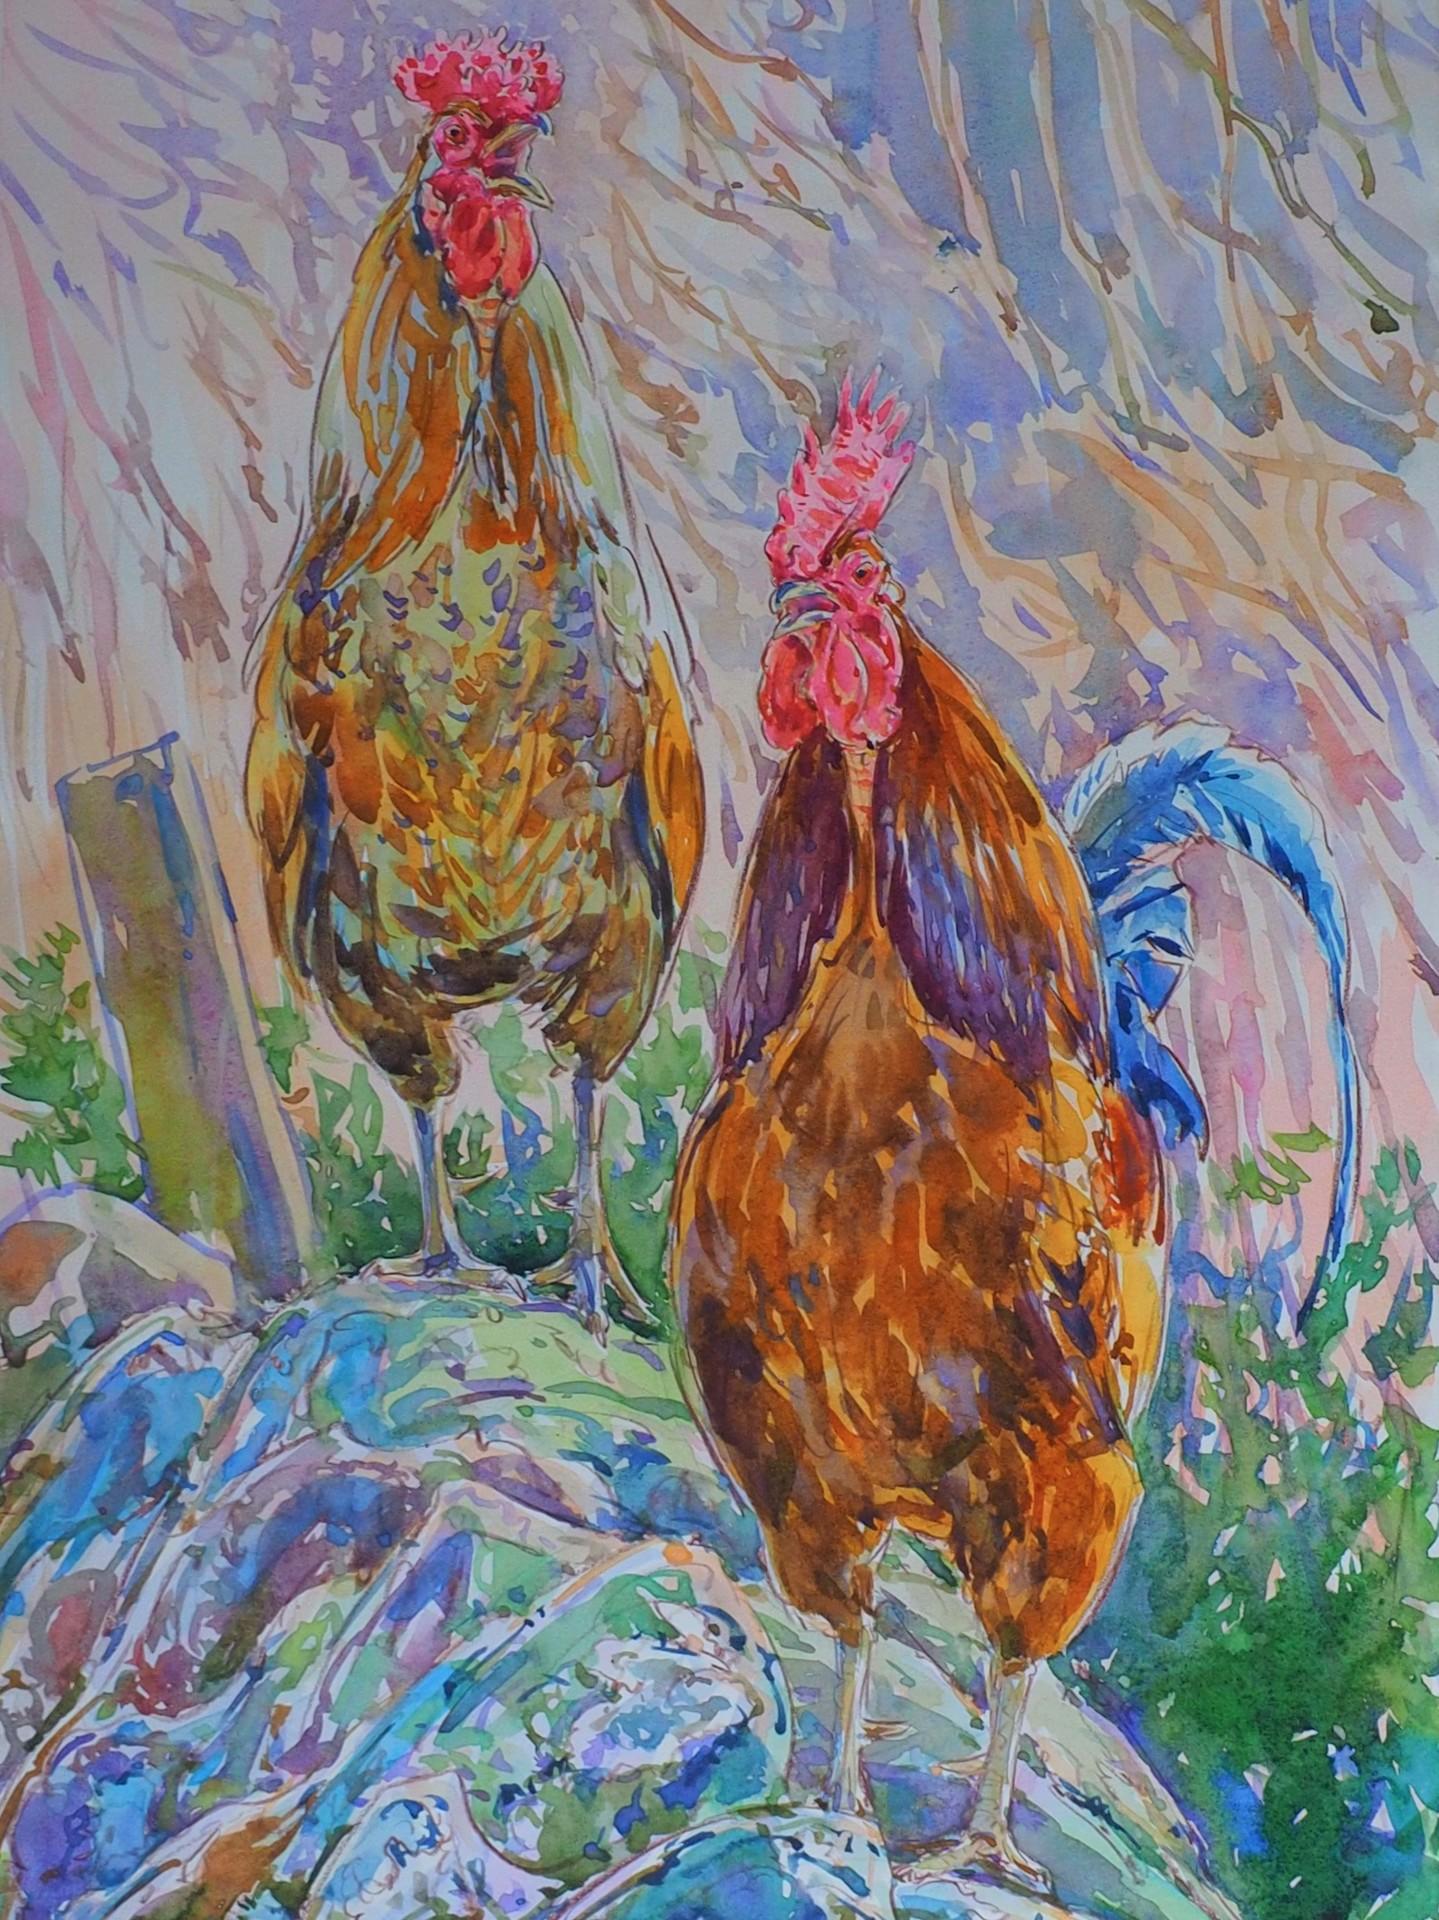 Cockerels on Wall, Dallowgill